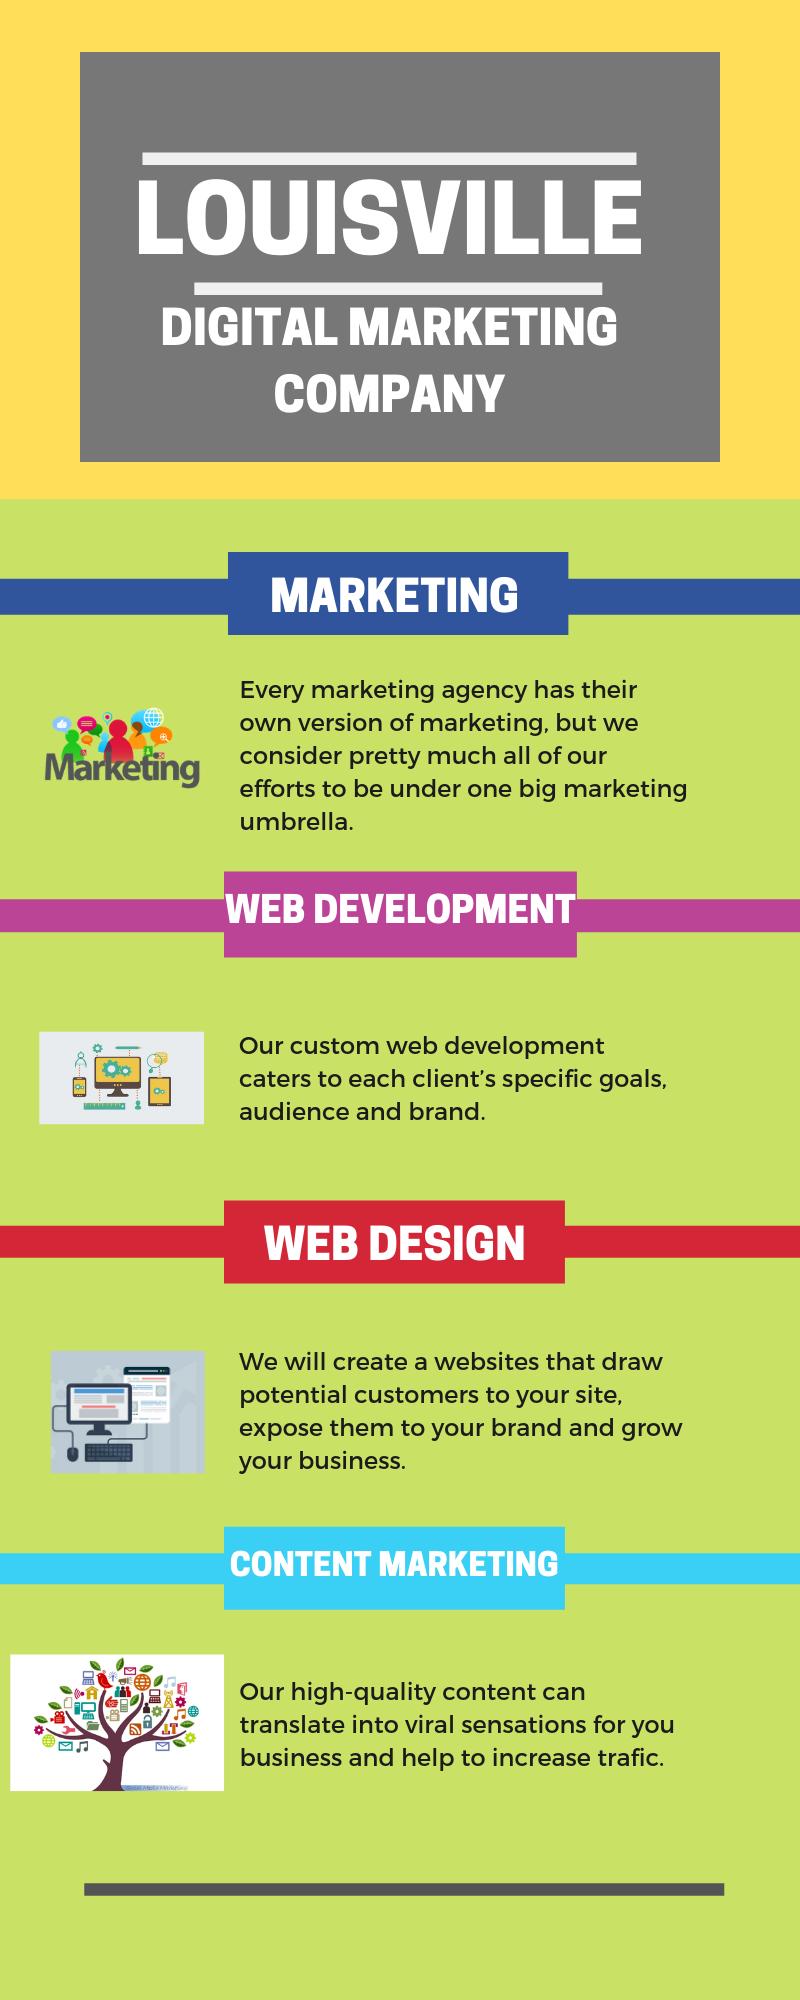 Louisville Drupal Development Agency With Images Digital Marketing Company Digital Marketing Development